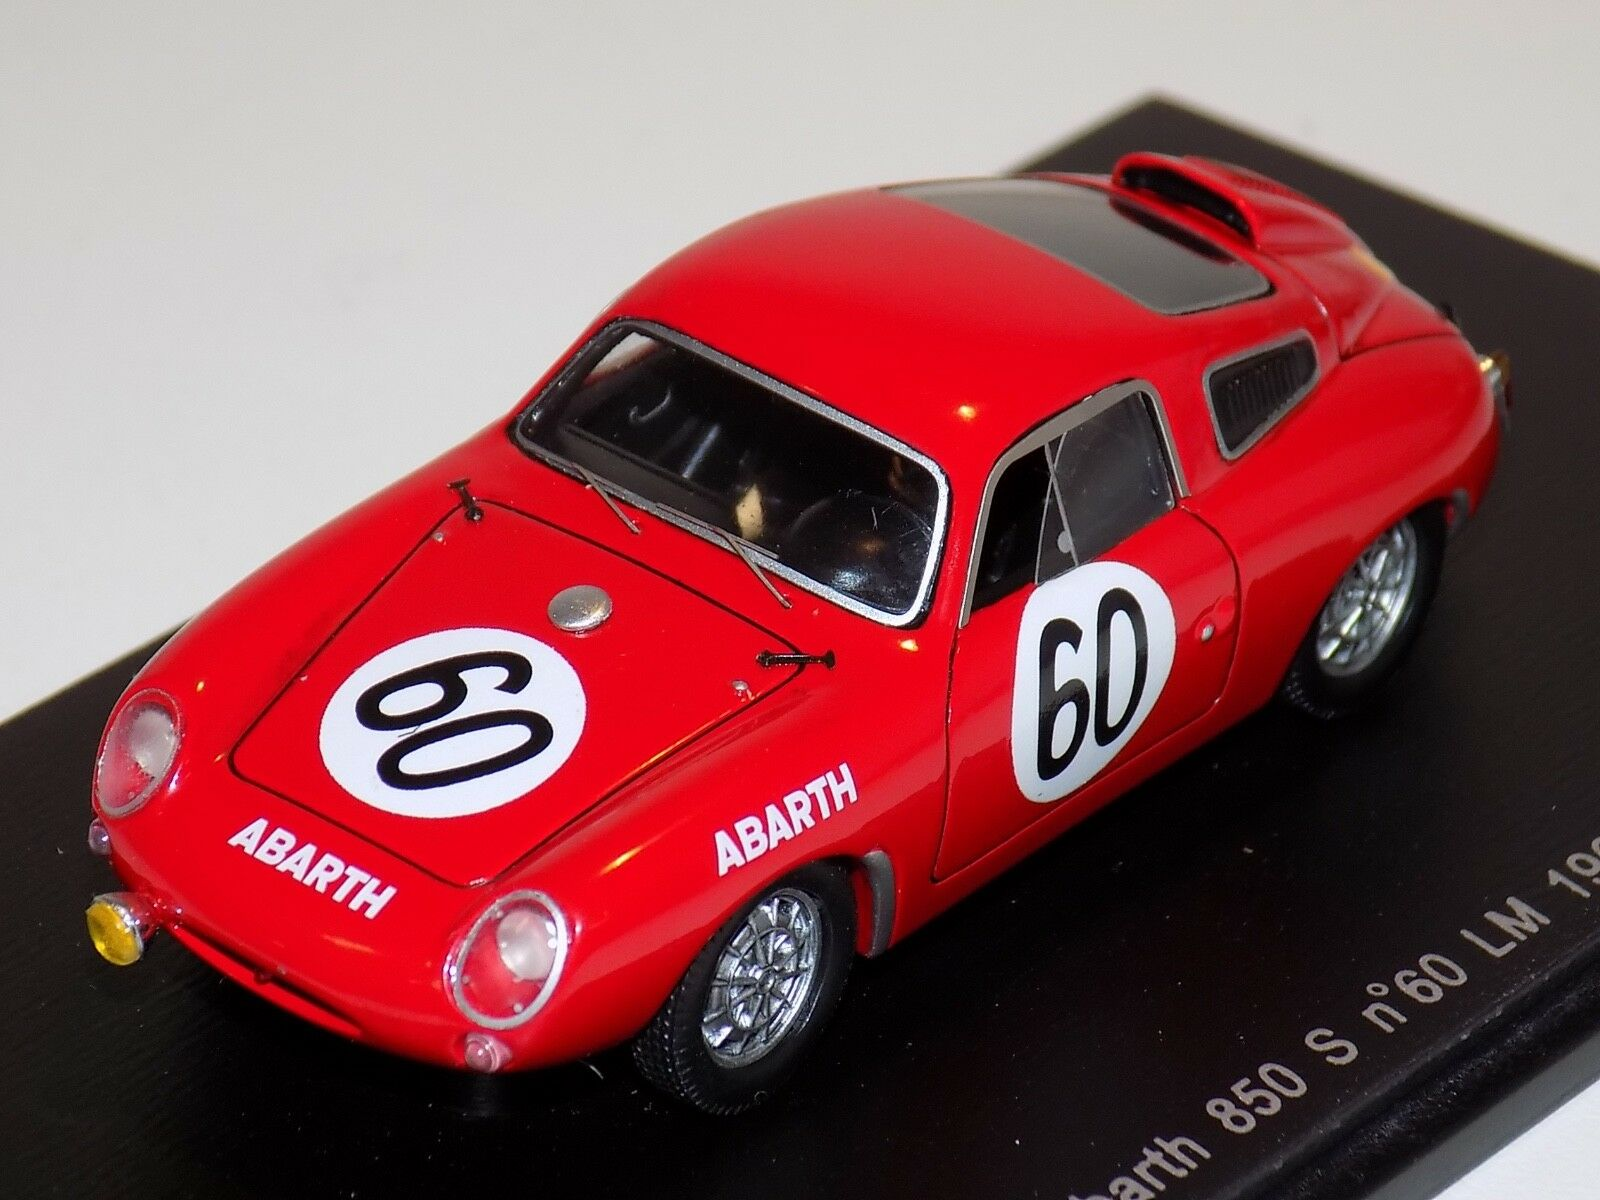 1 43 Spark Abarth voiture 850 S  60 14th 24 H DU MANS 1961 Hulme Hyslop S1333